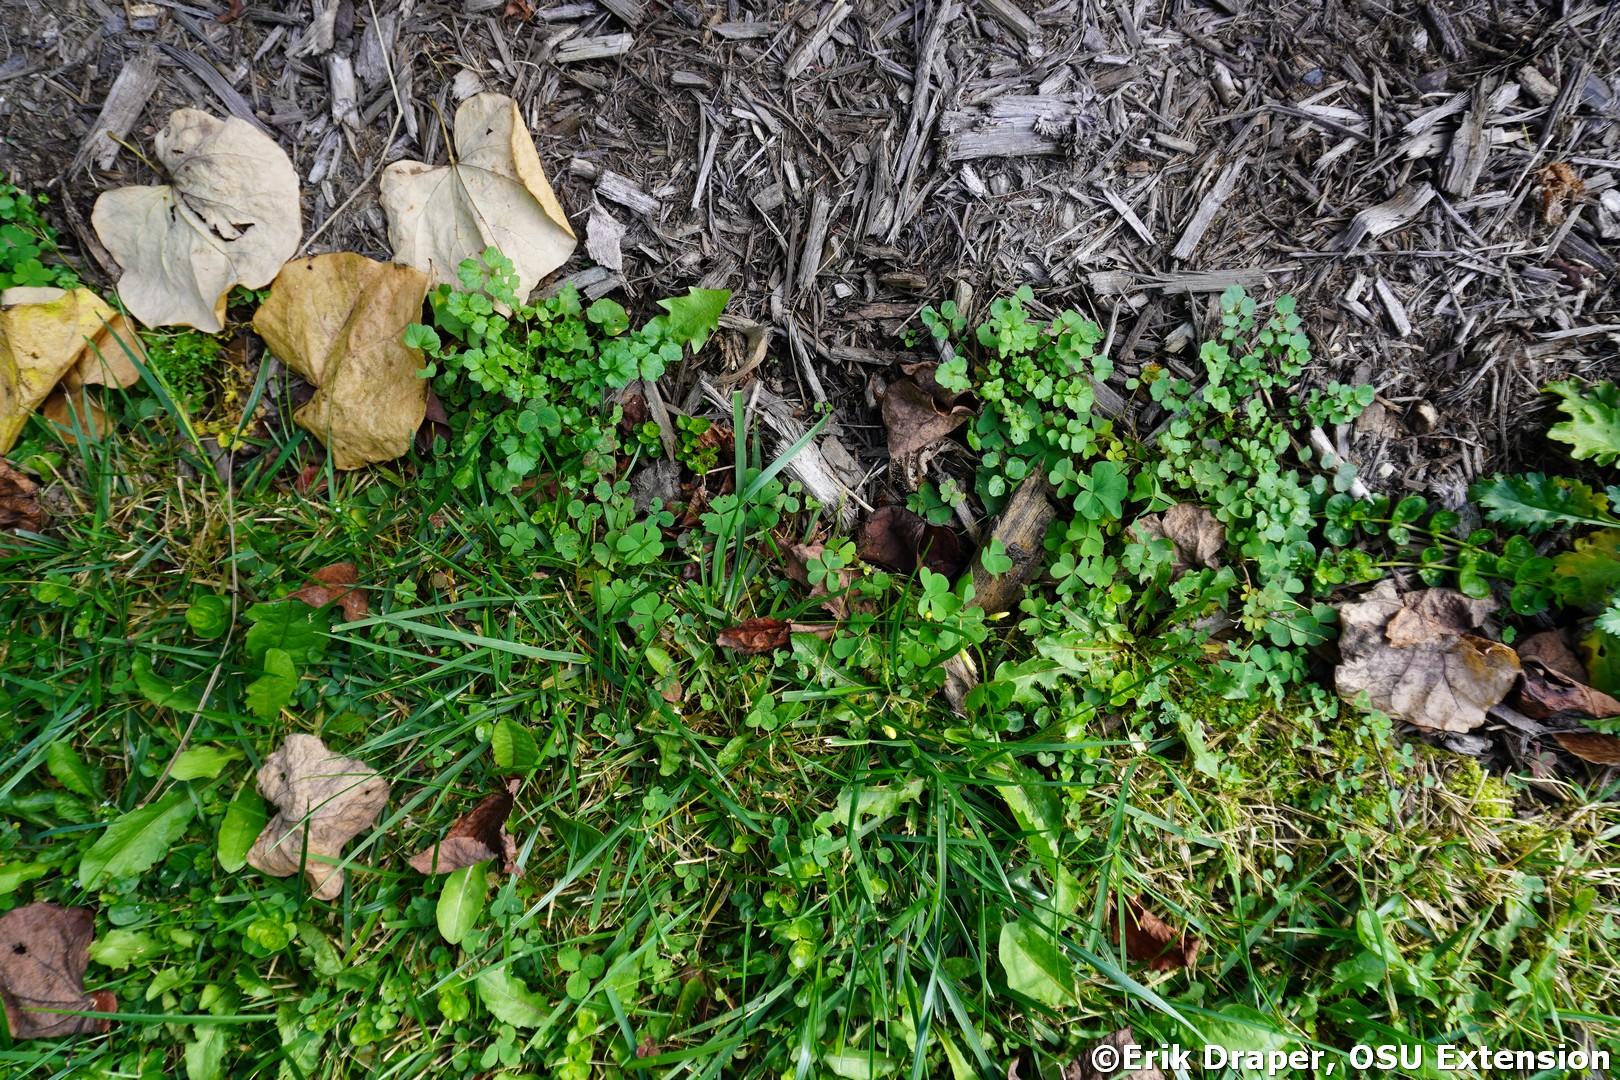 Hairy Bittercress, Cardamine hirsuta young seedling plants